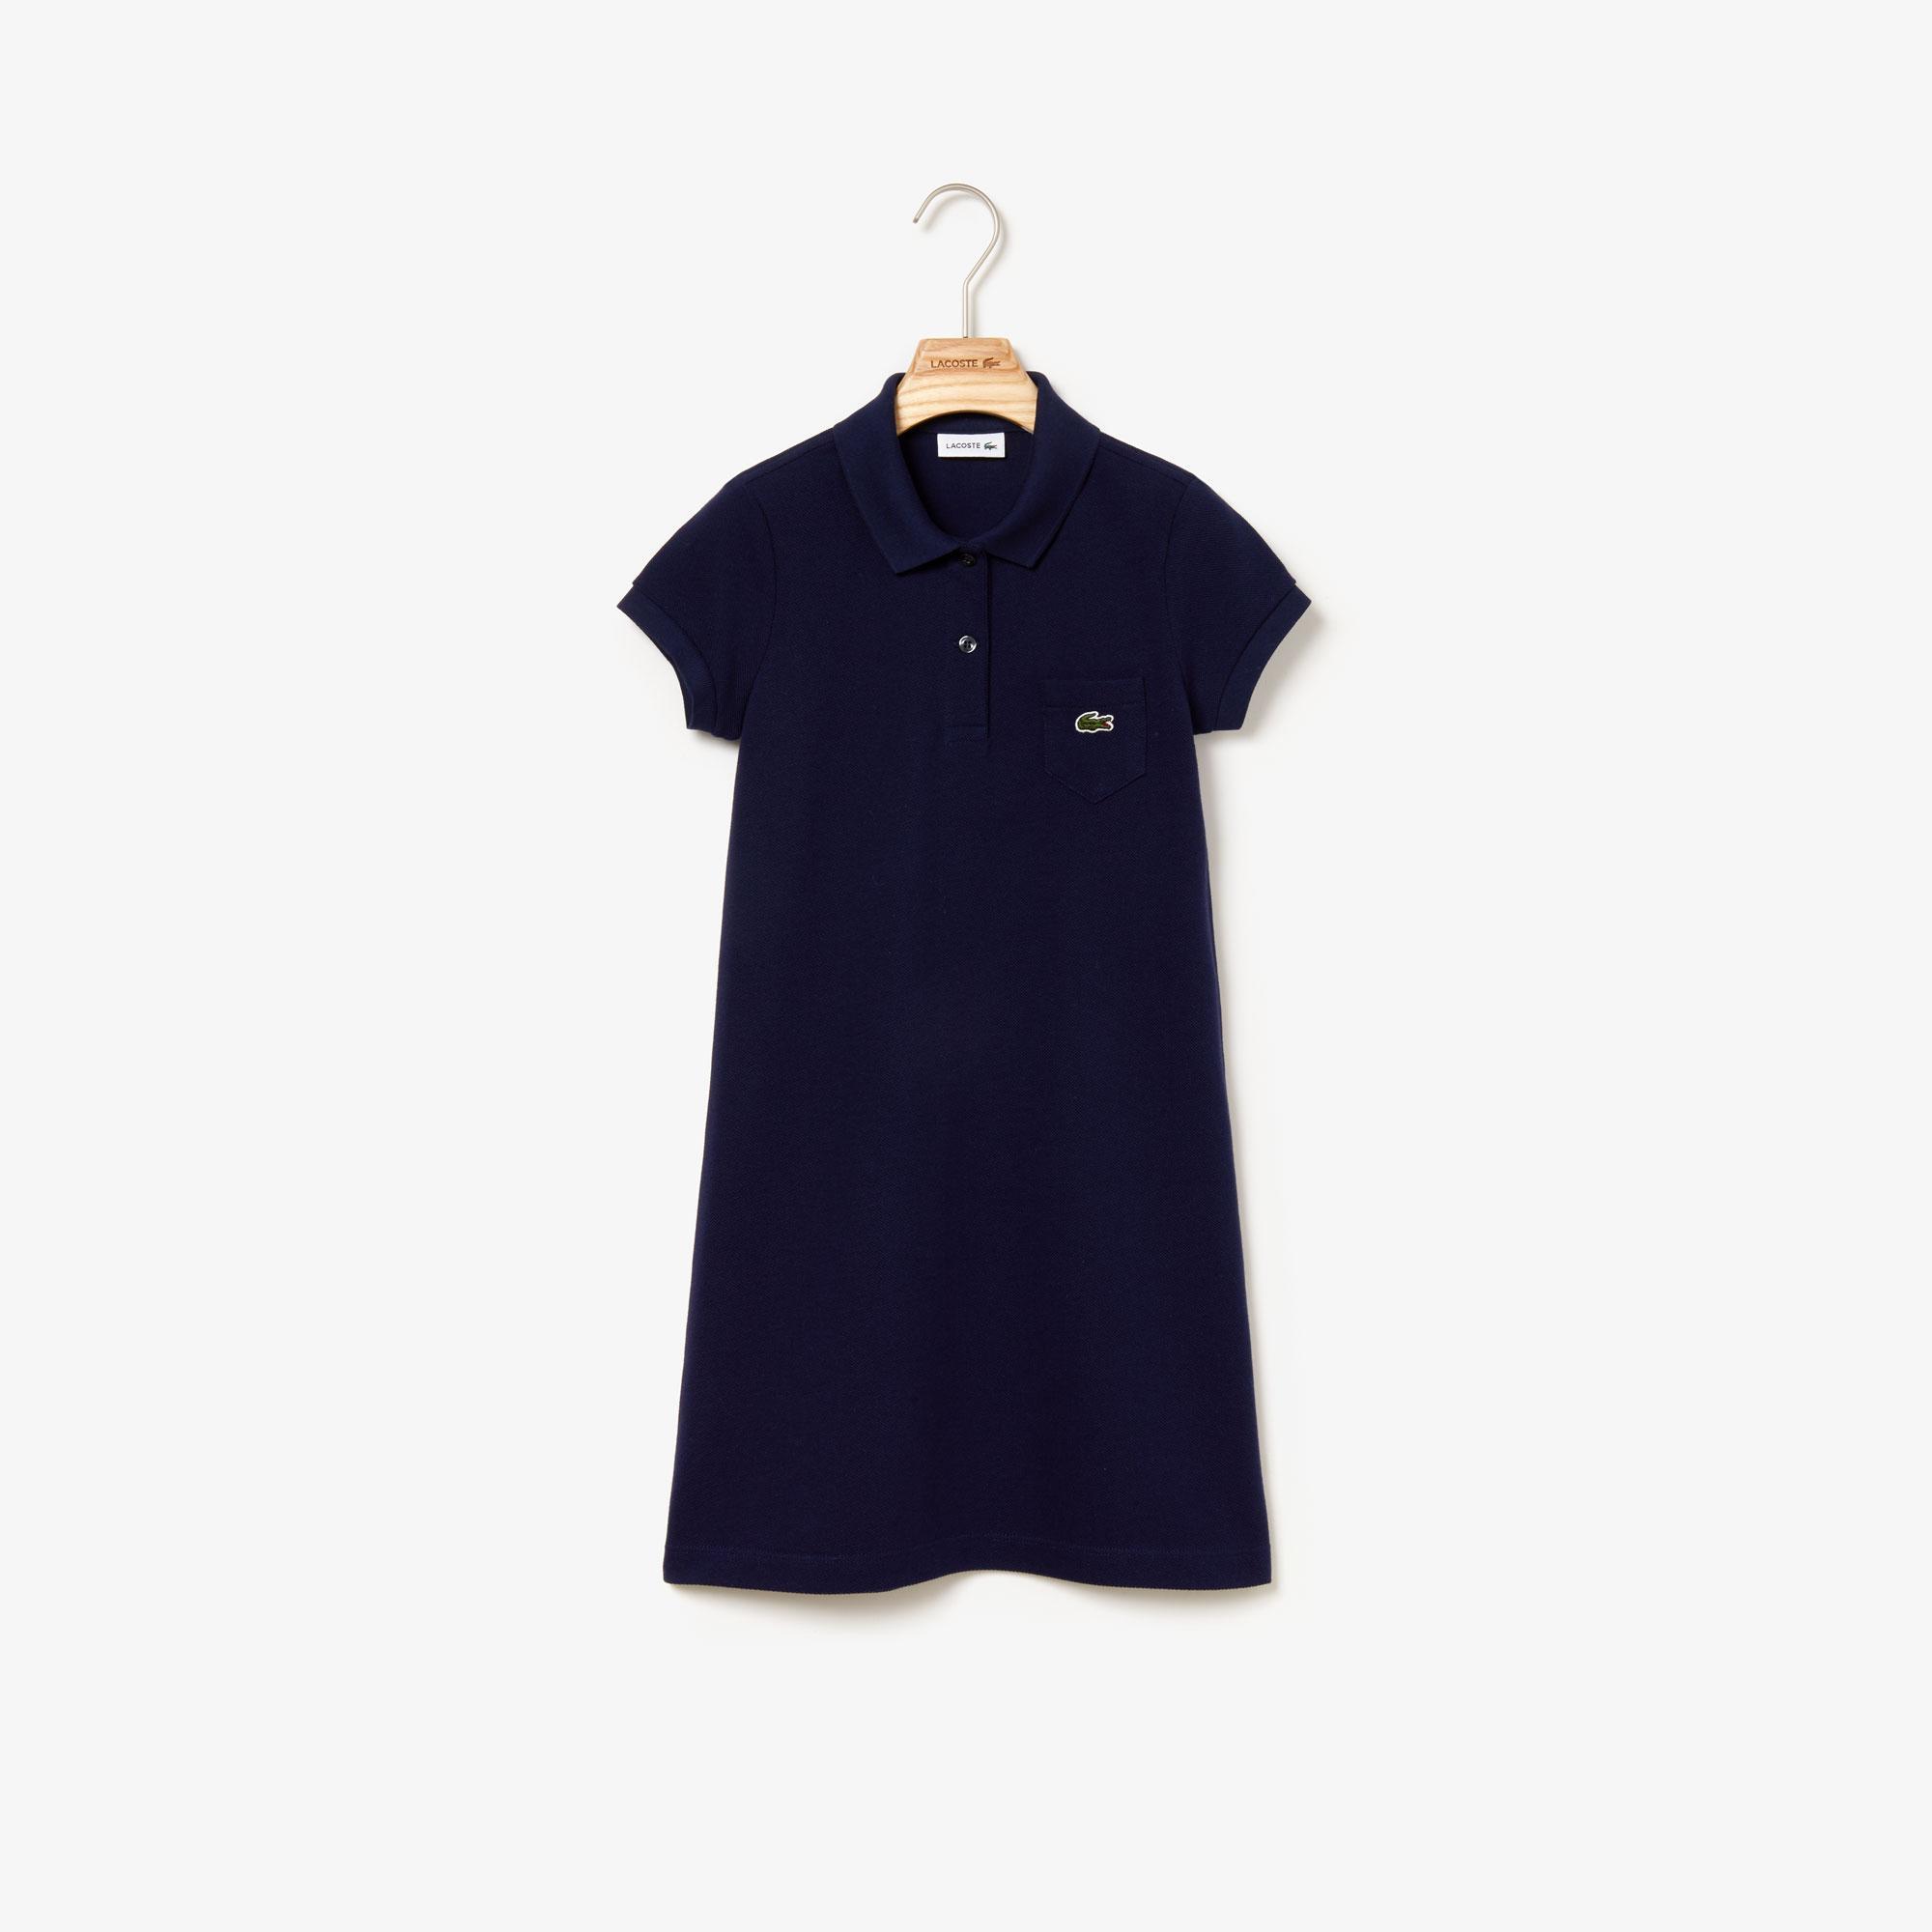 Lacoste Çocuk Lacivert Polo Yaka Elbise